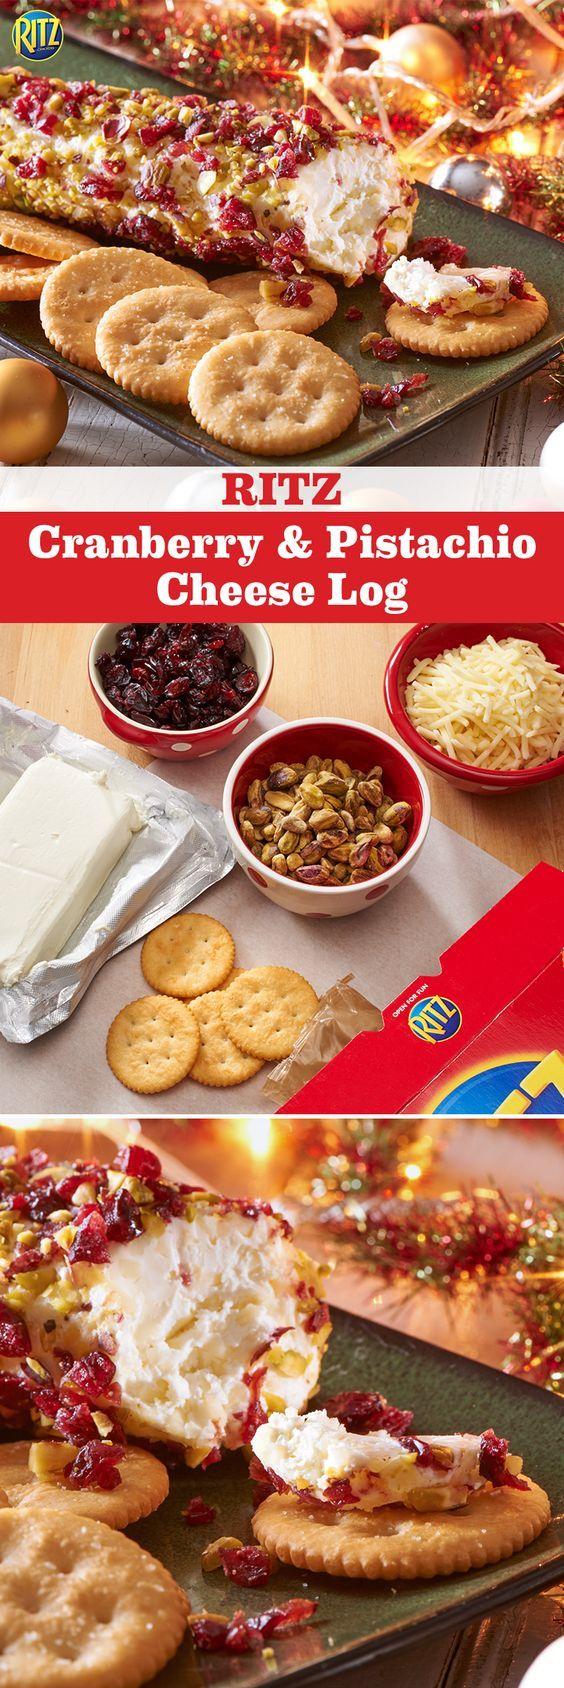 Cranberry & Pistachio Cheese Log